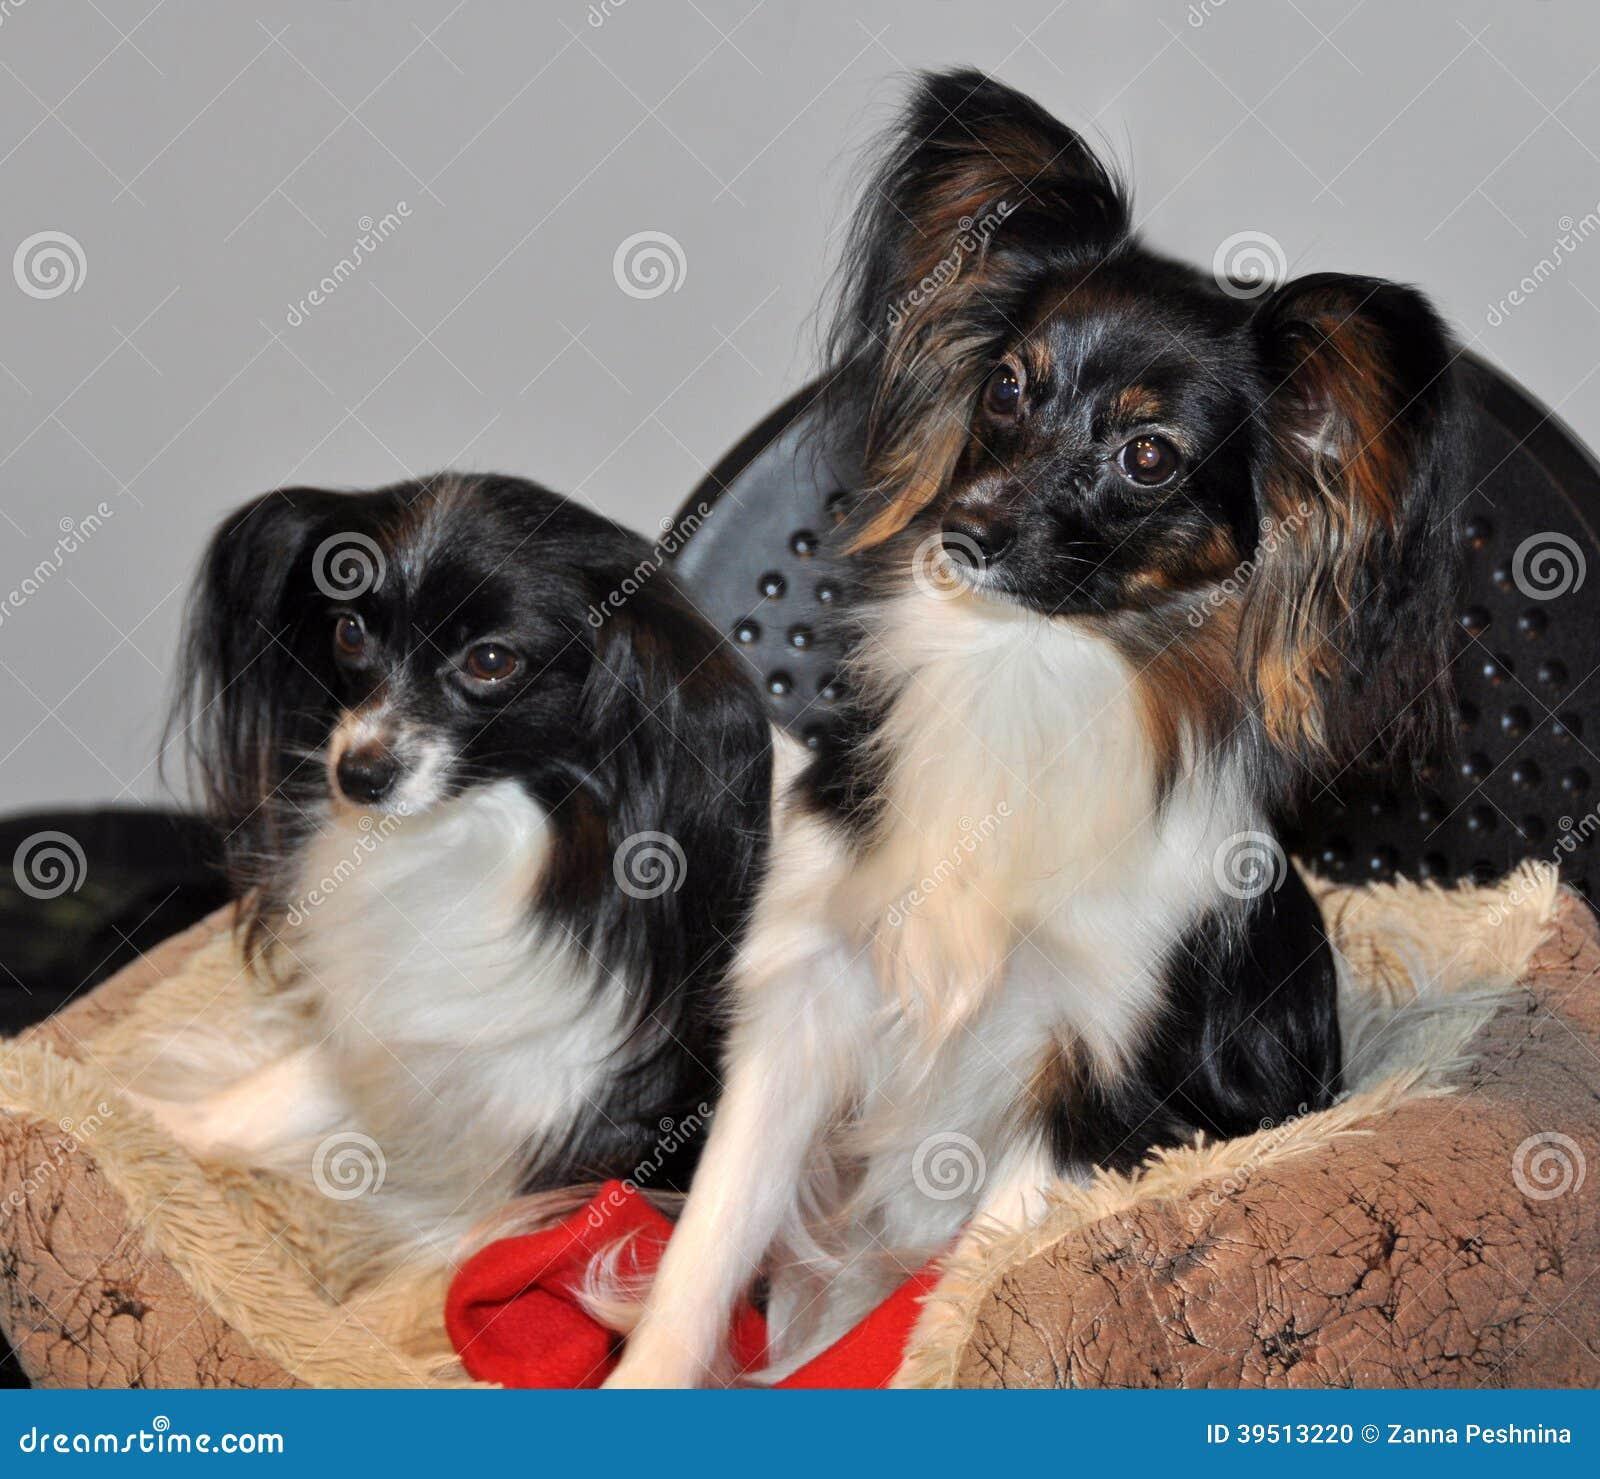 Papillon dog and Phalen dog